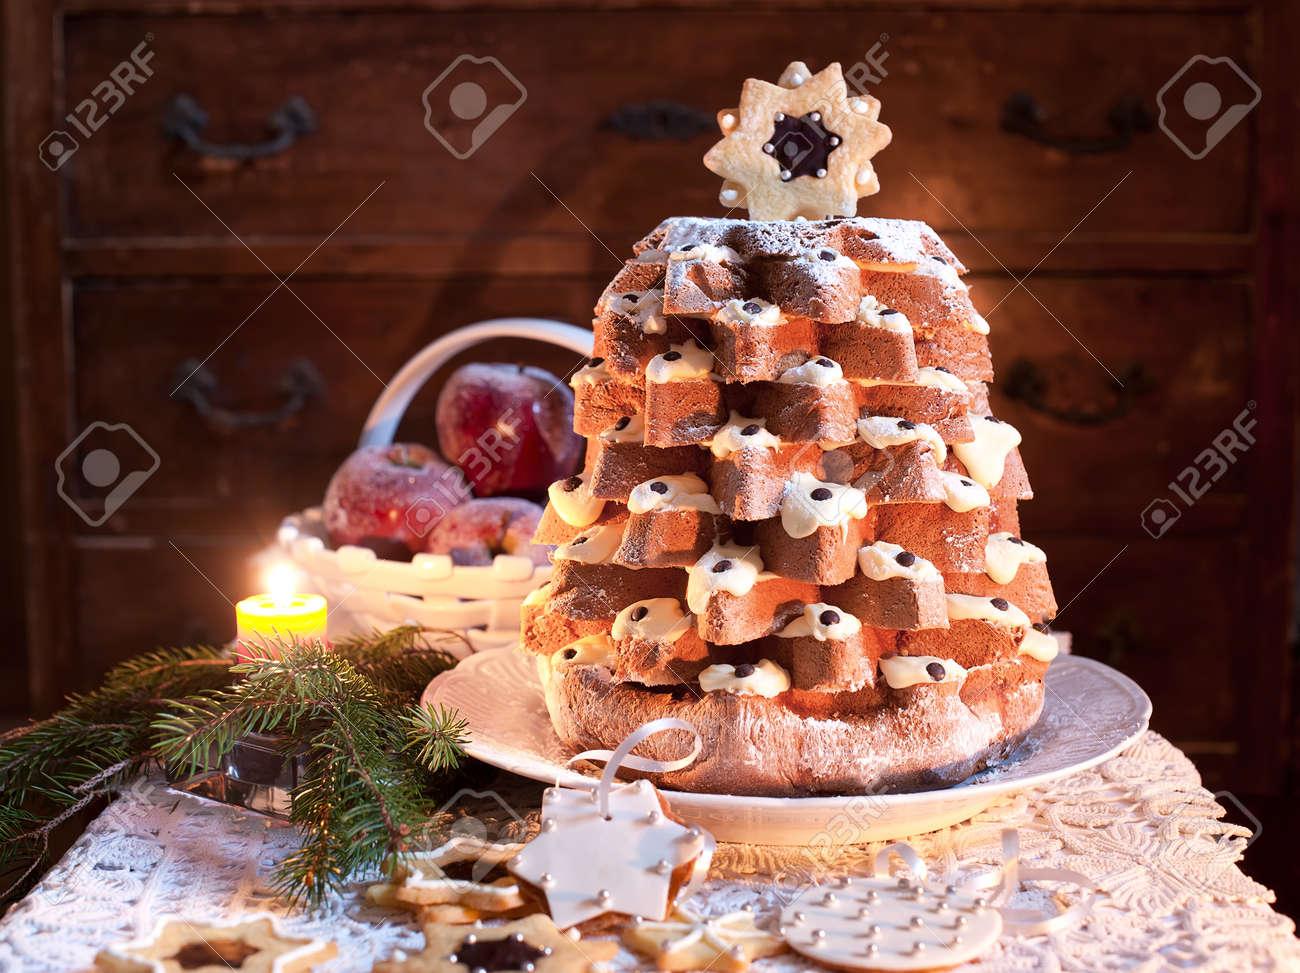 Pandoro (pan D'oro) Is A Traditional Italian Sweet Yeast Bread ...